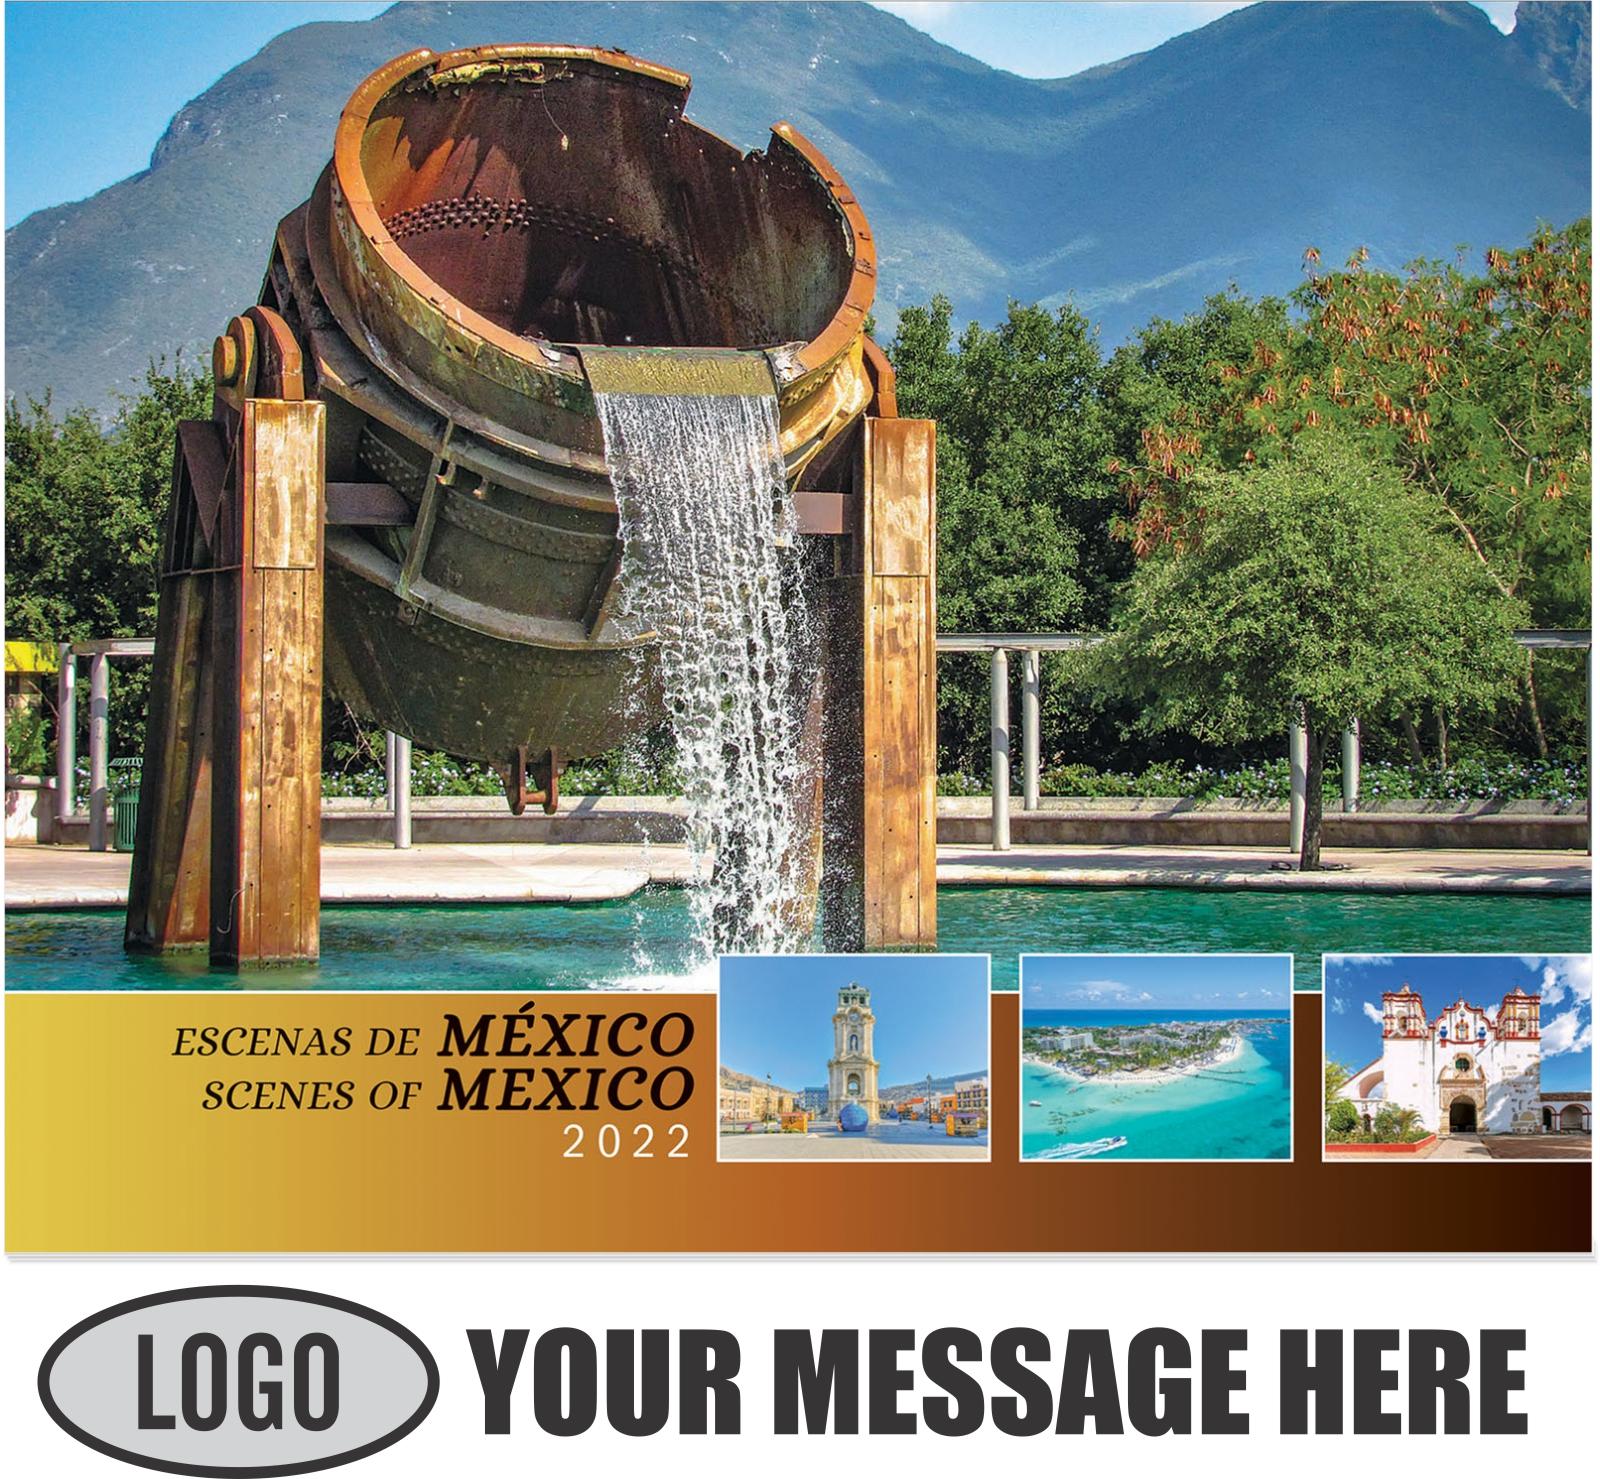 2022 Scenes of Mexico (Spanish-English bilingual) Promotional Calendar